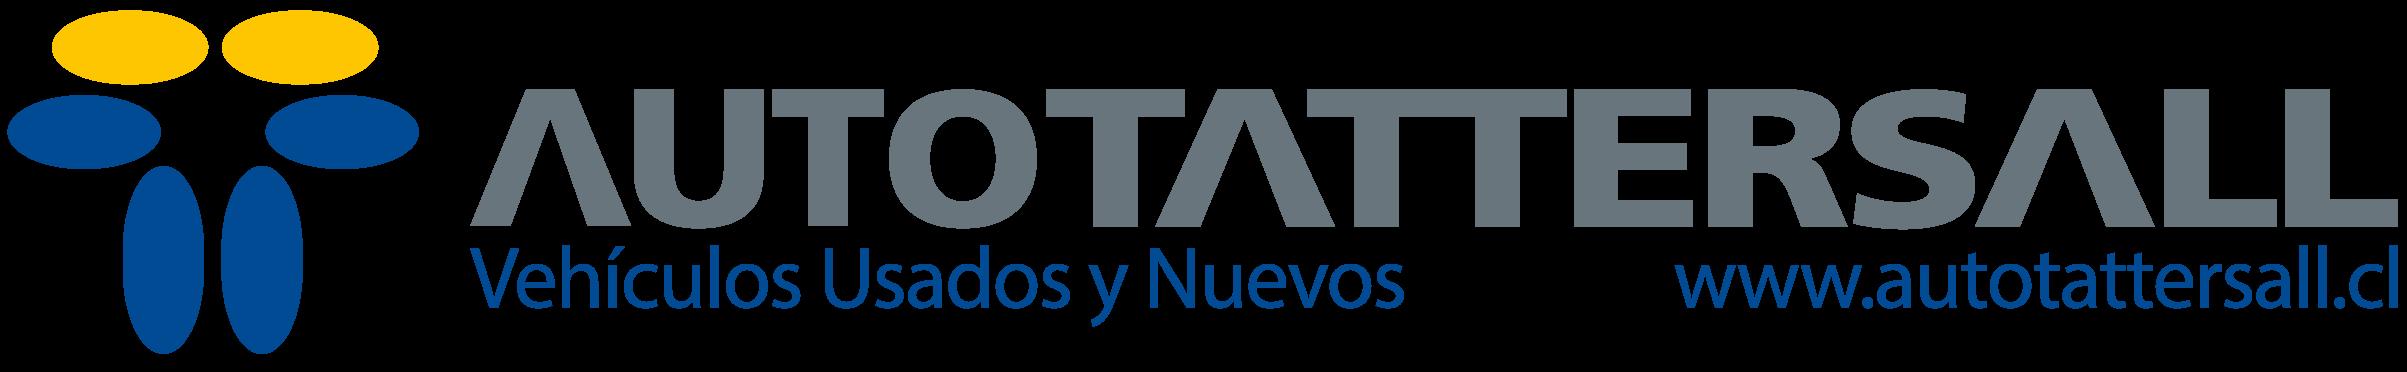 logoTattersall